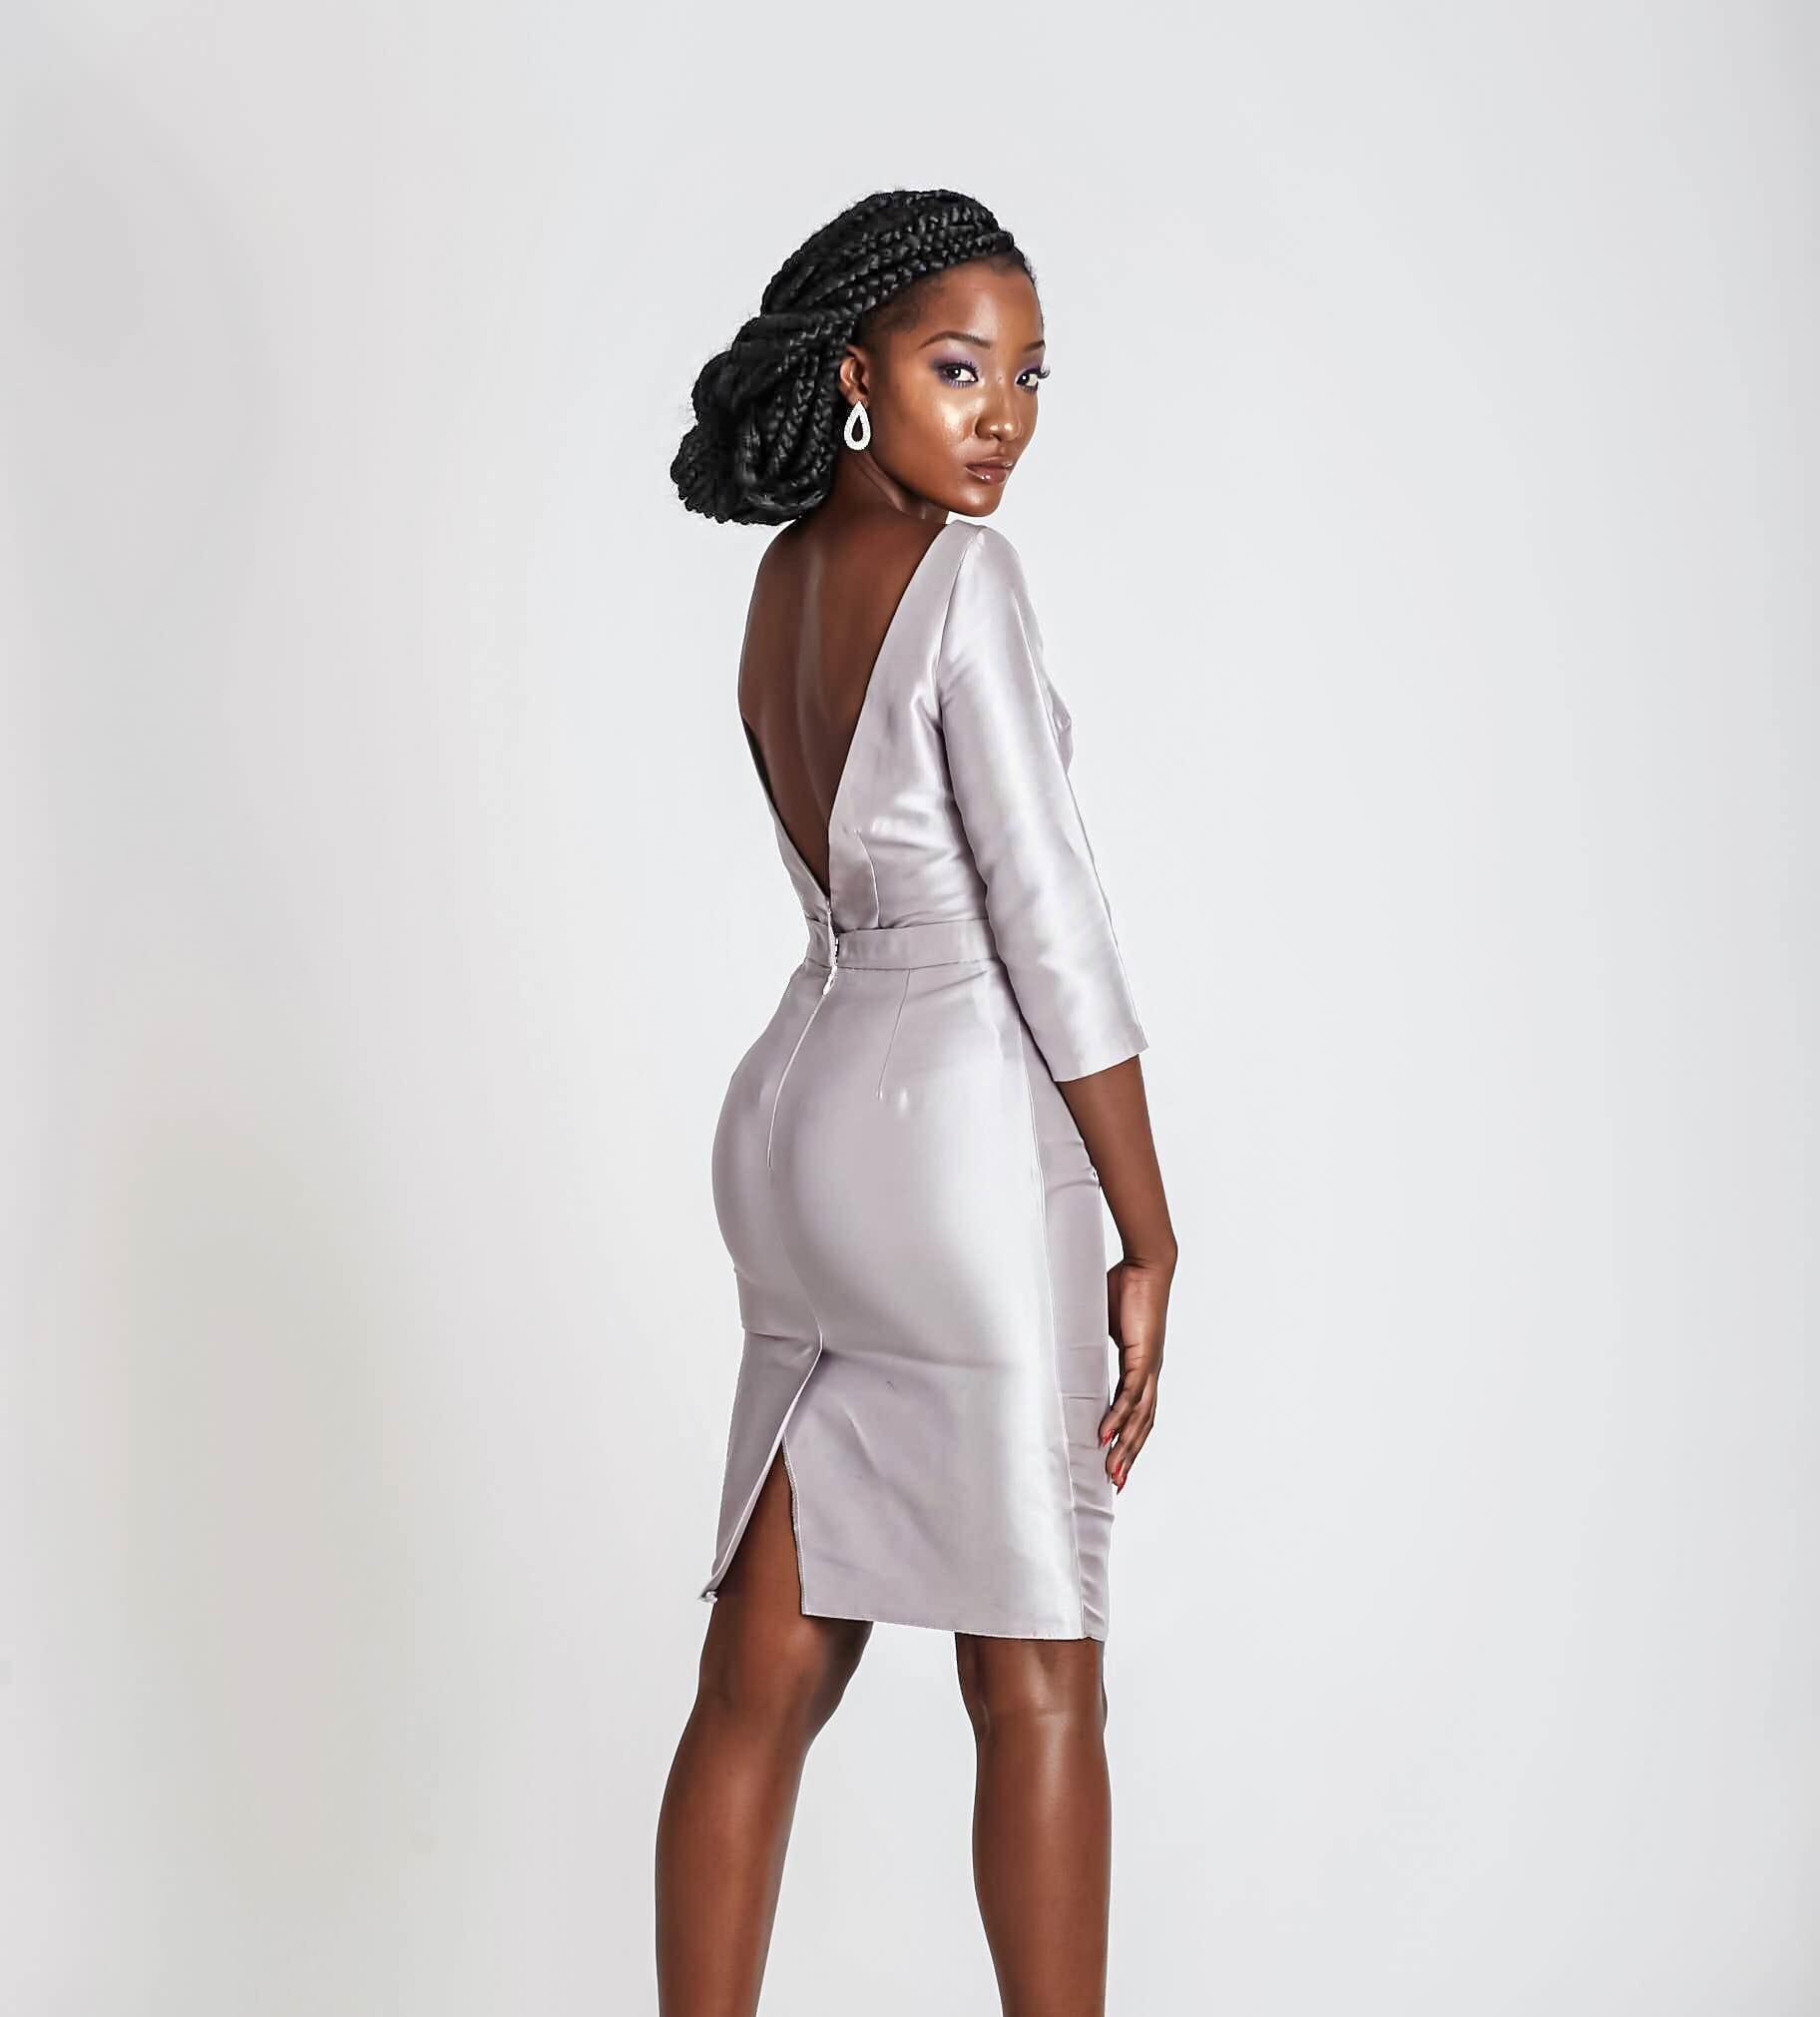 Imad Eduso - BN Style - Collection Lookbook - BellaNaija.com 023